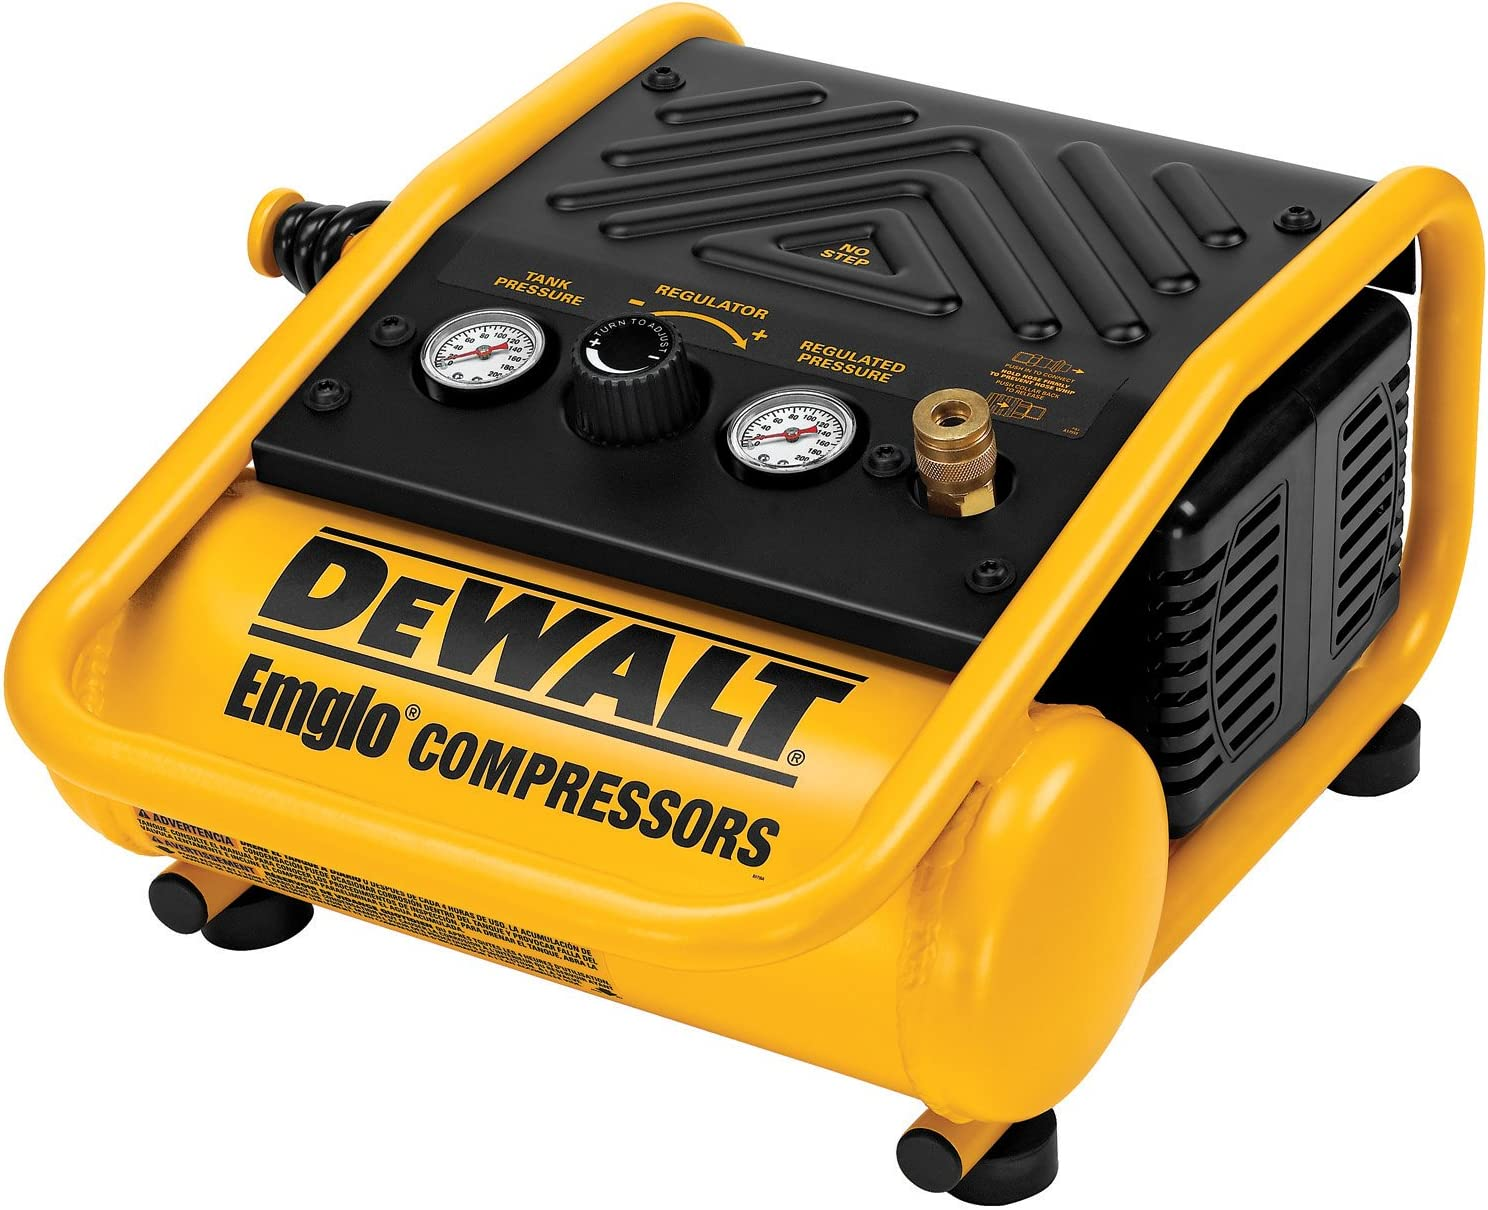 Built for Performance 1.2 Gal Portable Oil-Free Trim Air Compressor